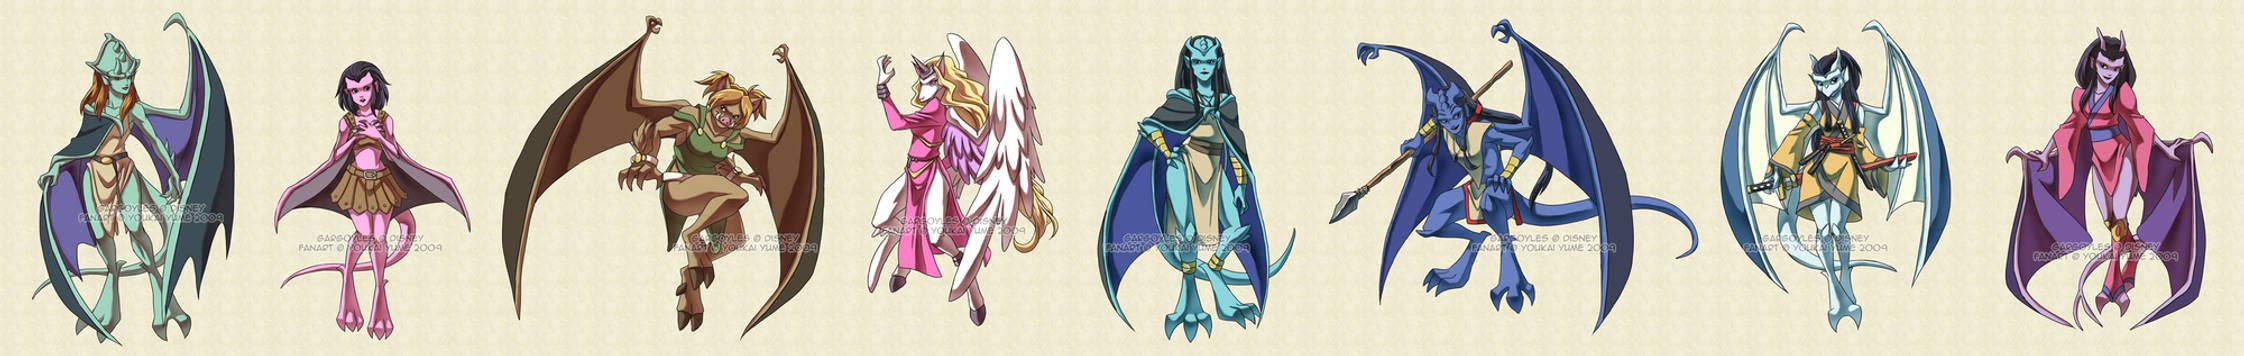 Gargoyles: Gar-girls 2